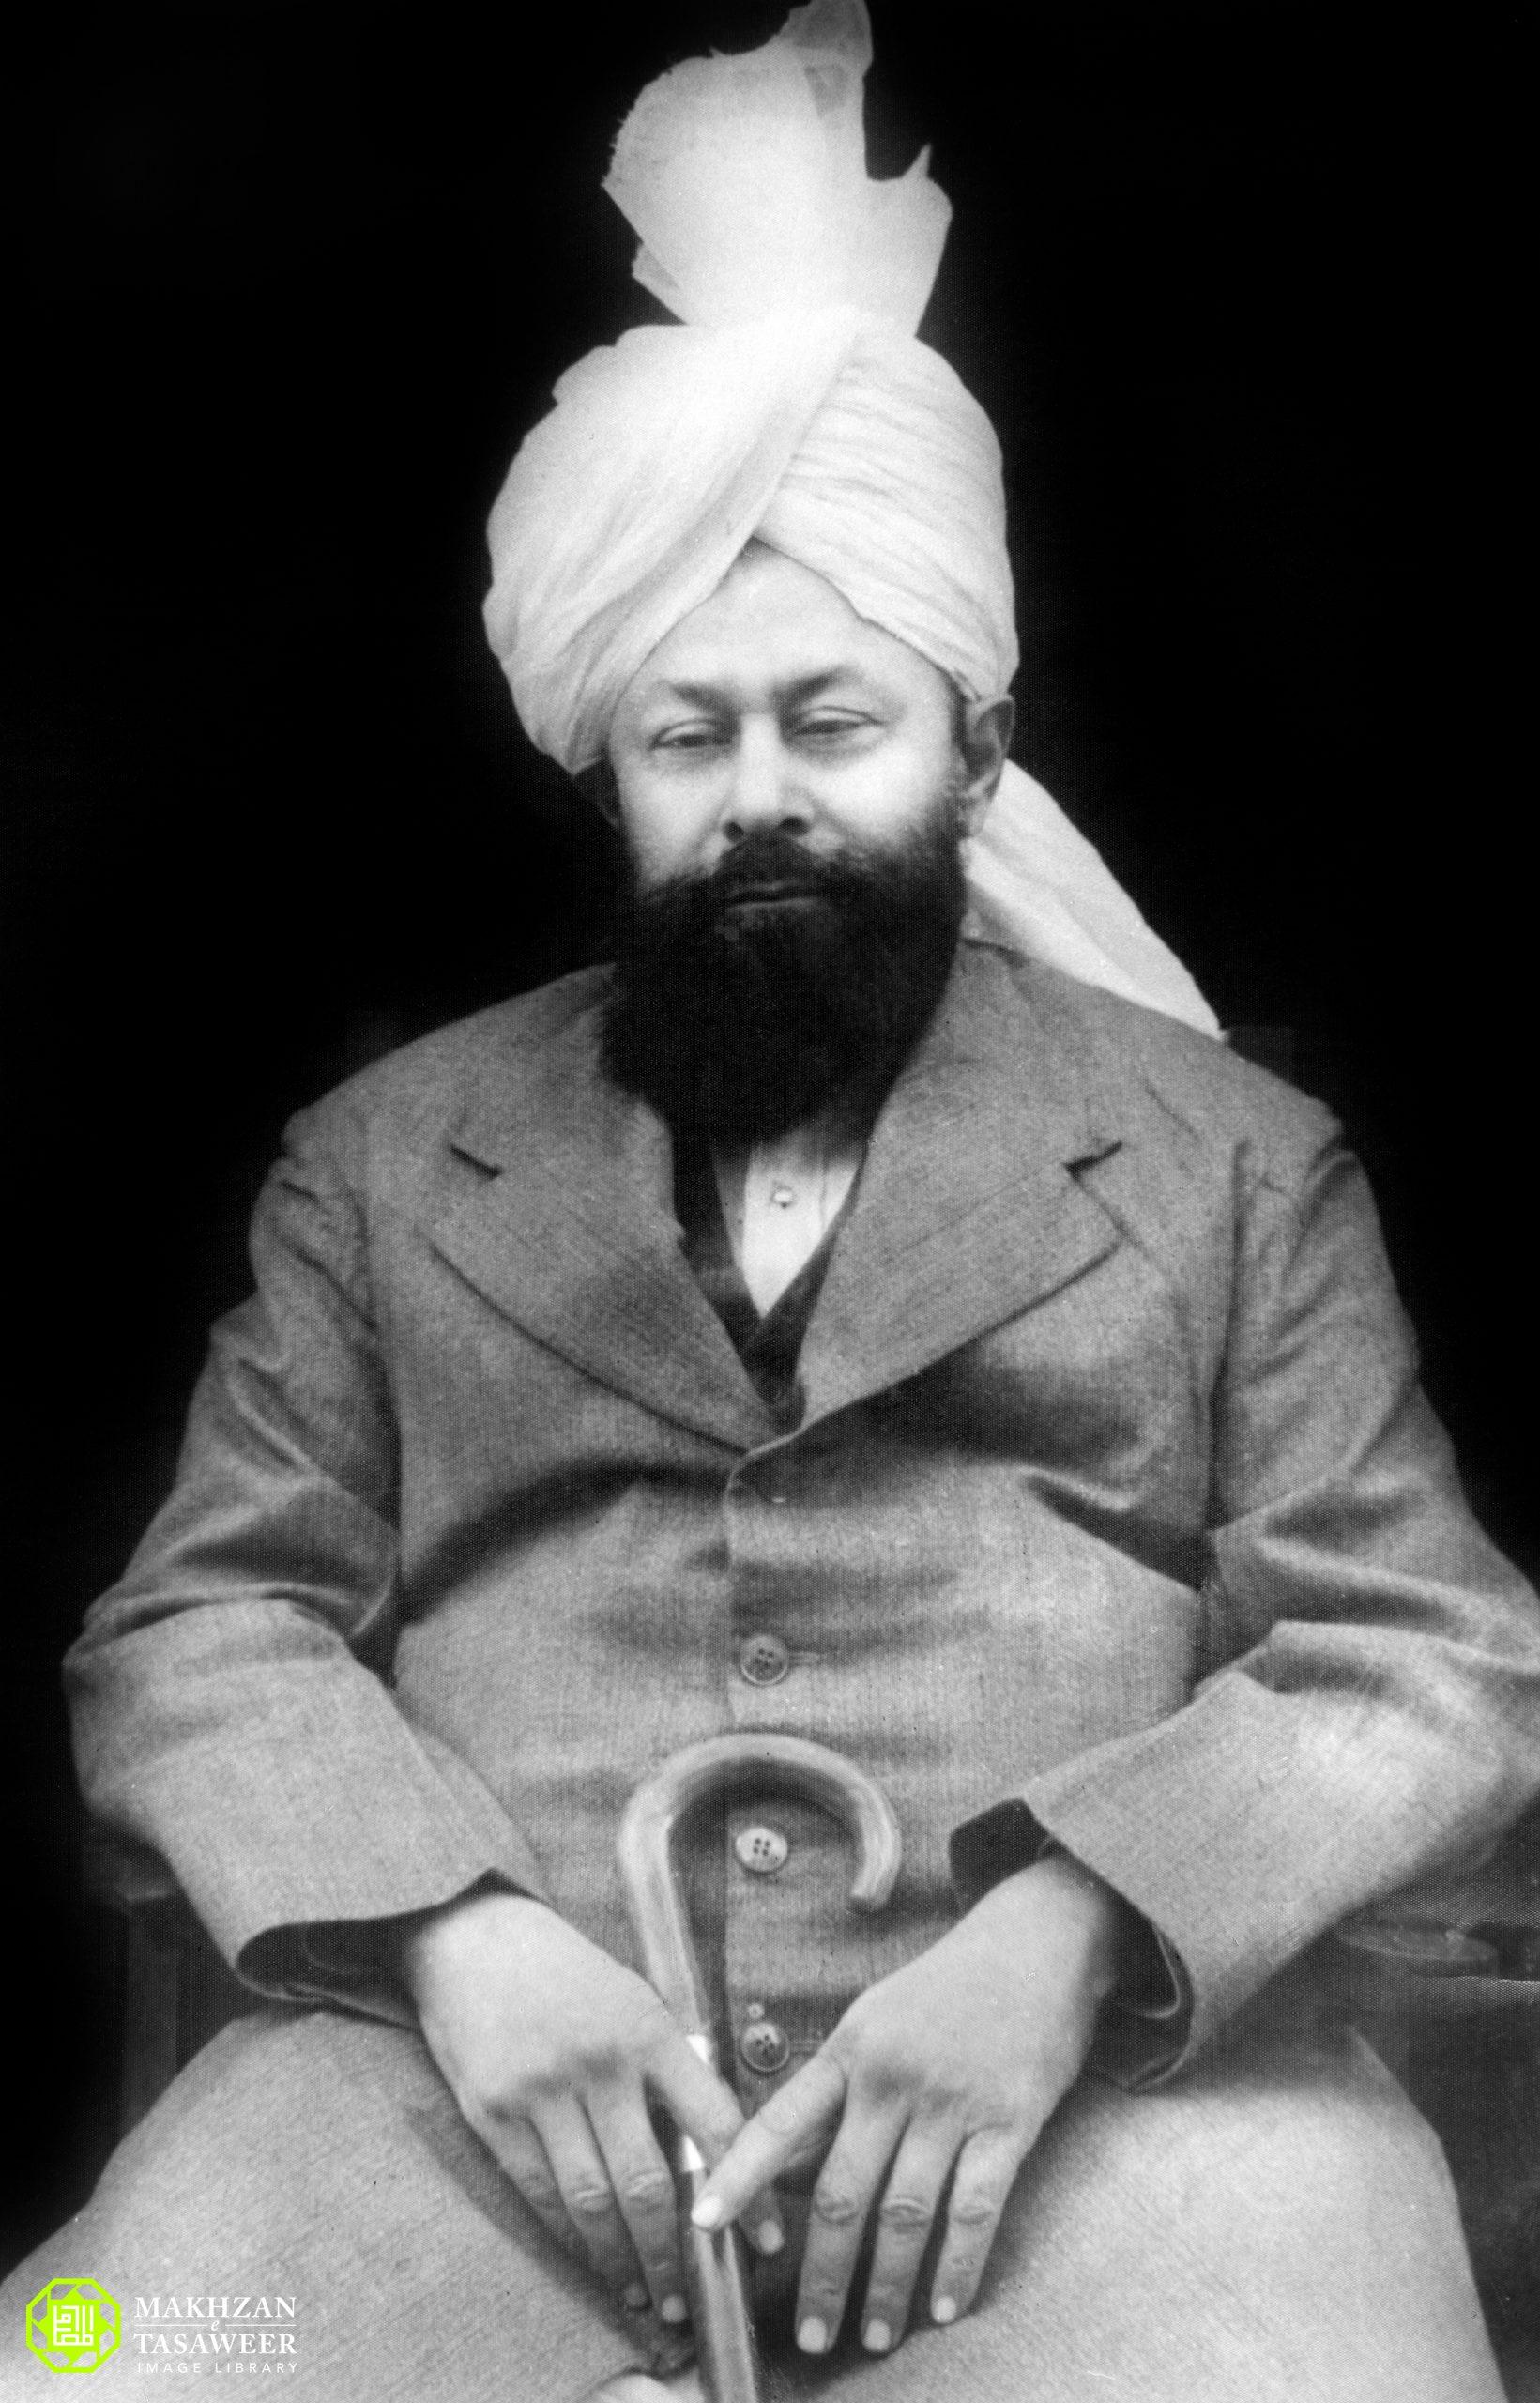 Hazrat Mirza Bashiruddin Mahmud Ahmad (ra), Second Caliph of the Ahmadiyya Muslim Community